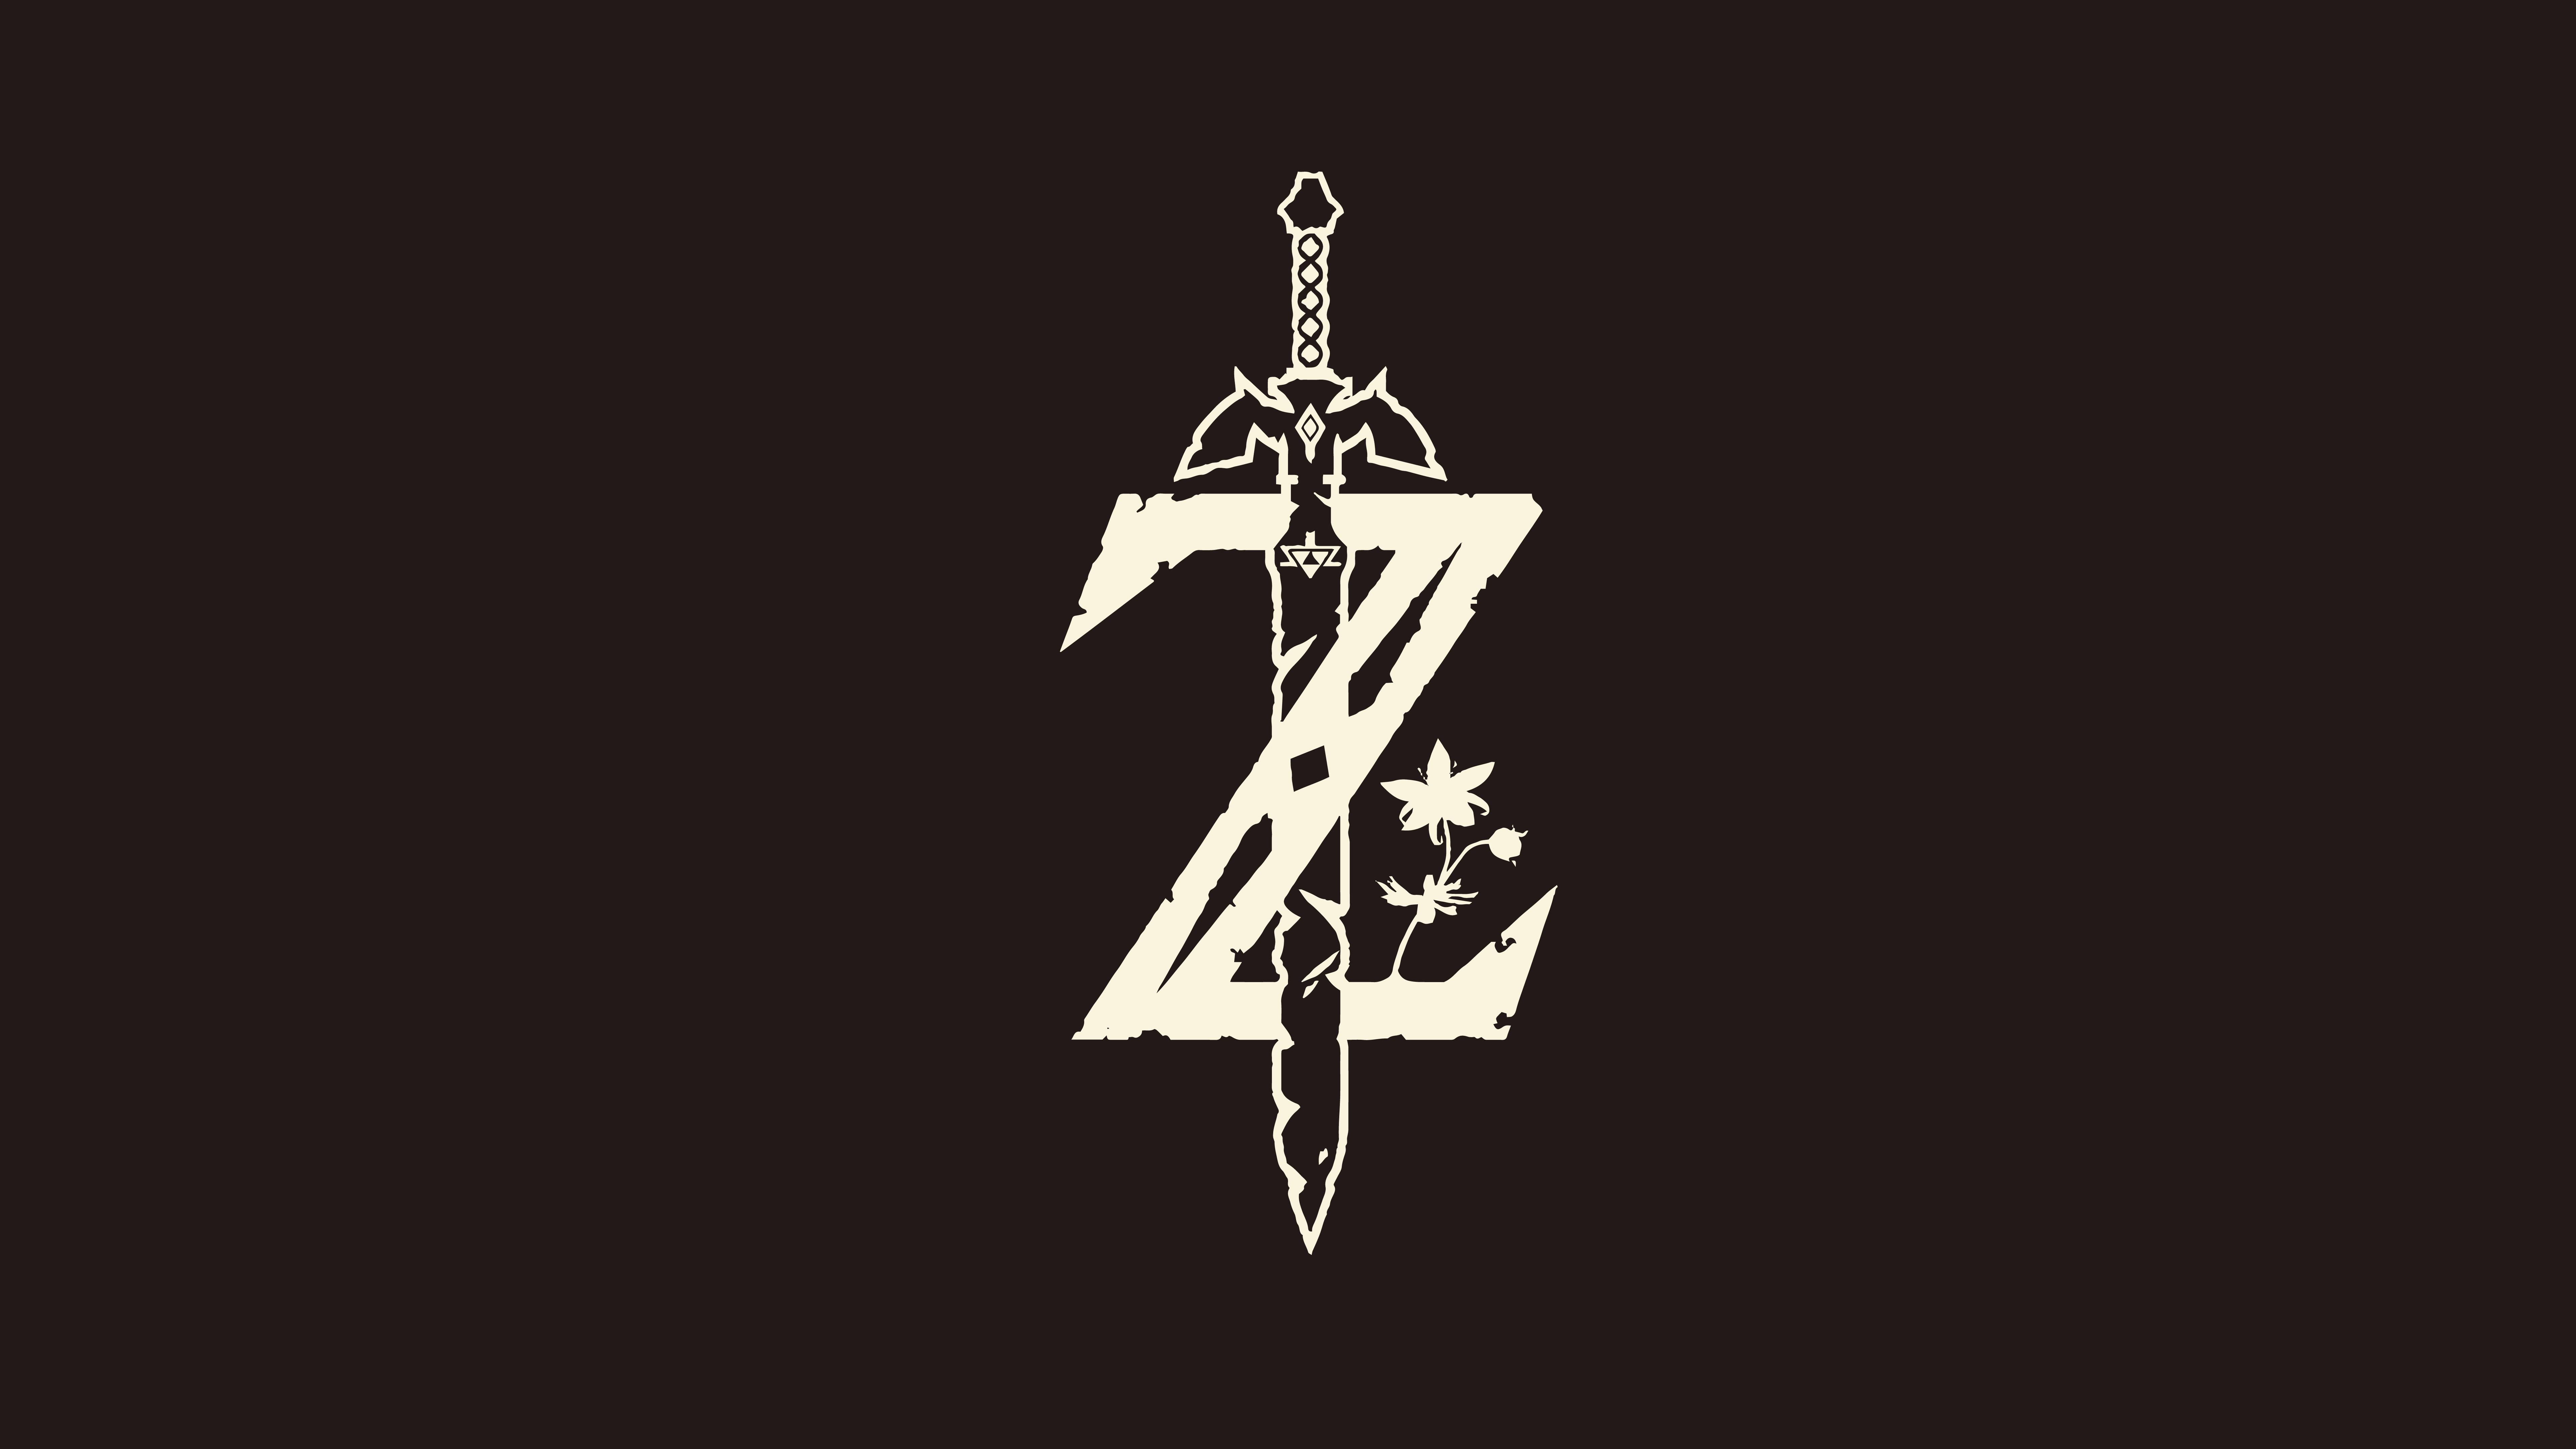 7680x4320 The Legend Of Zelda Minimalist 8k Hd 4k Wallpapers